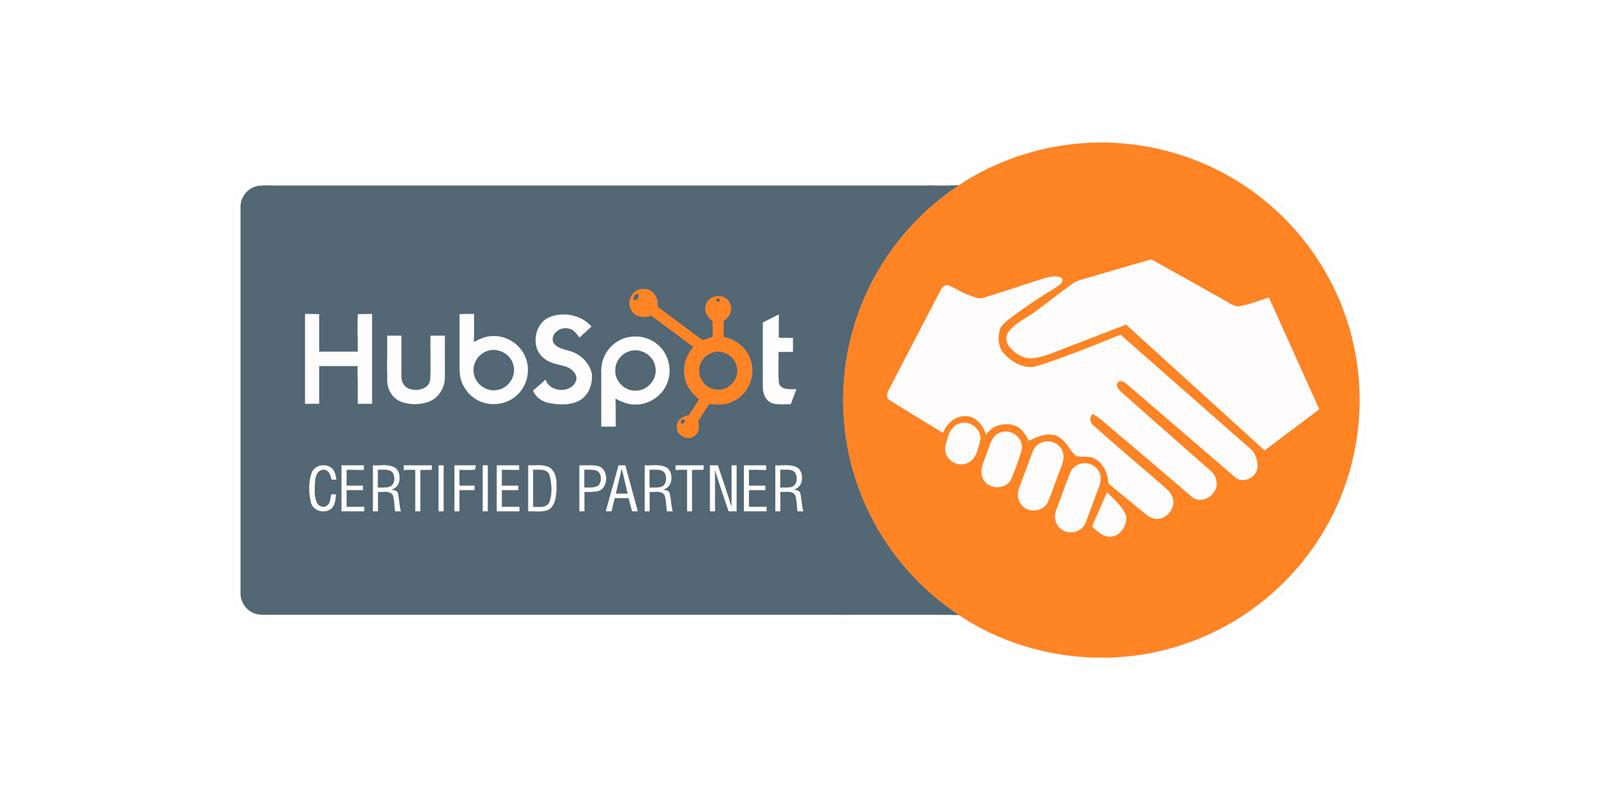 hubspot-partner-png